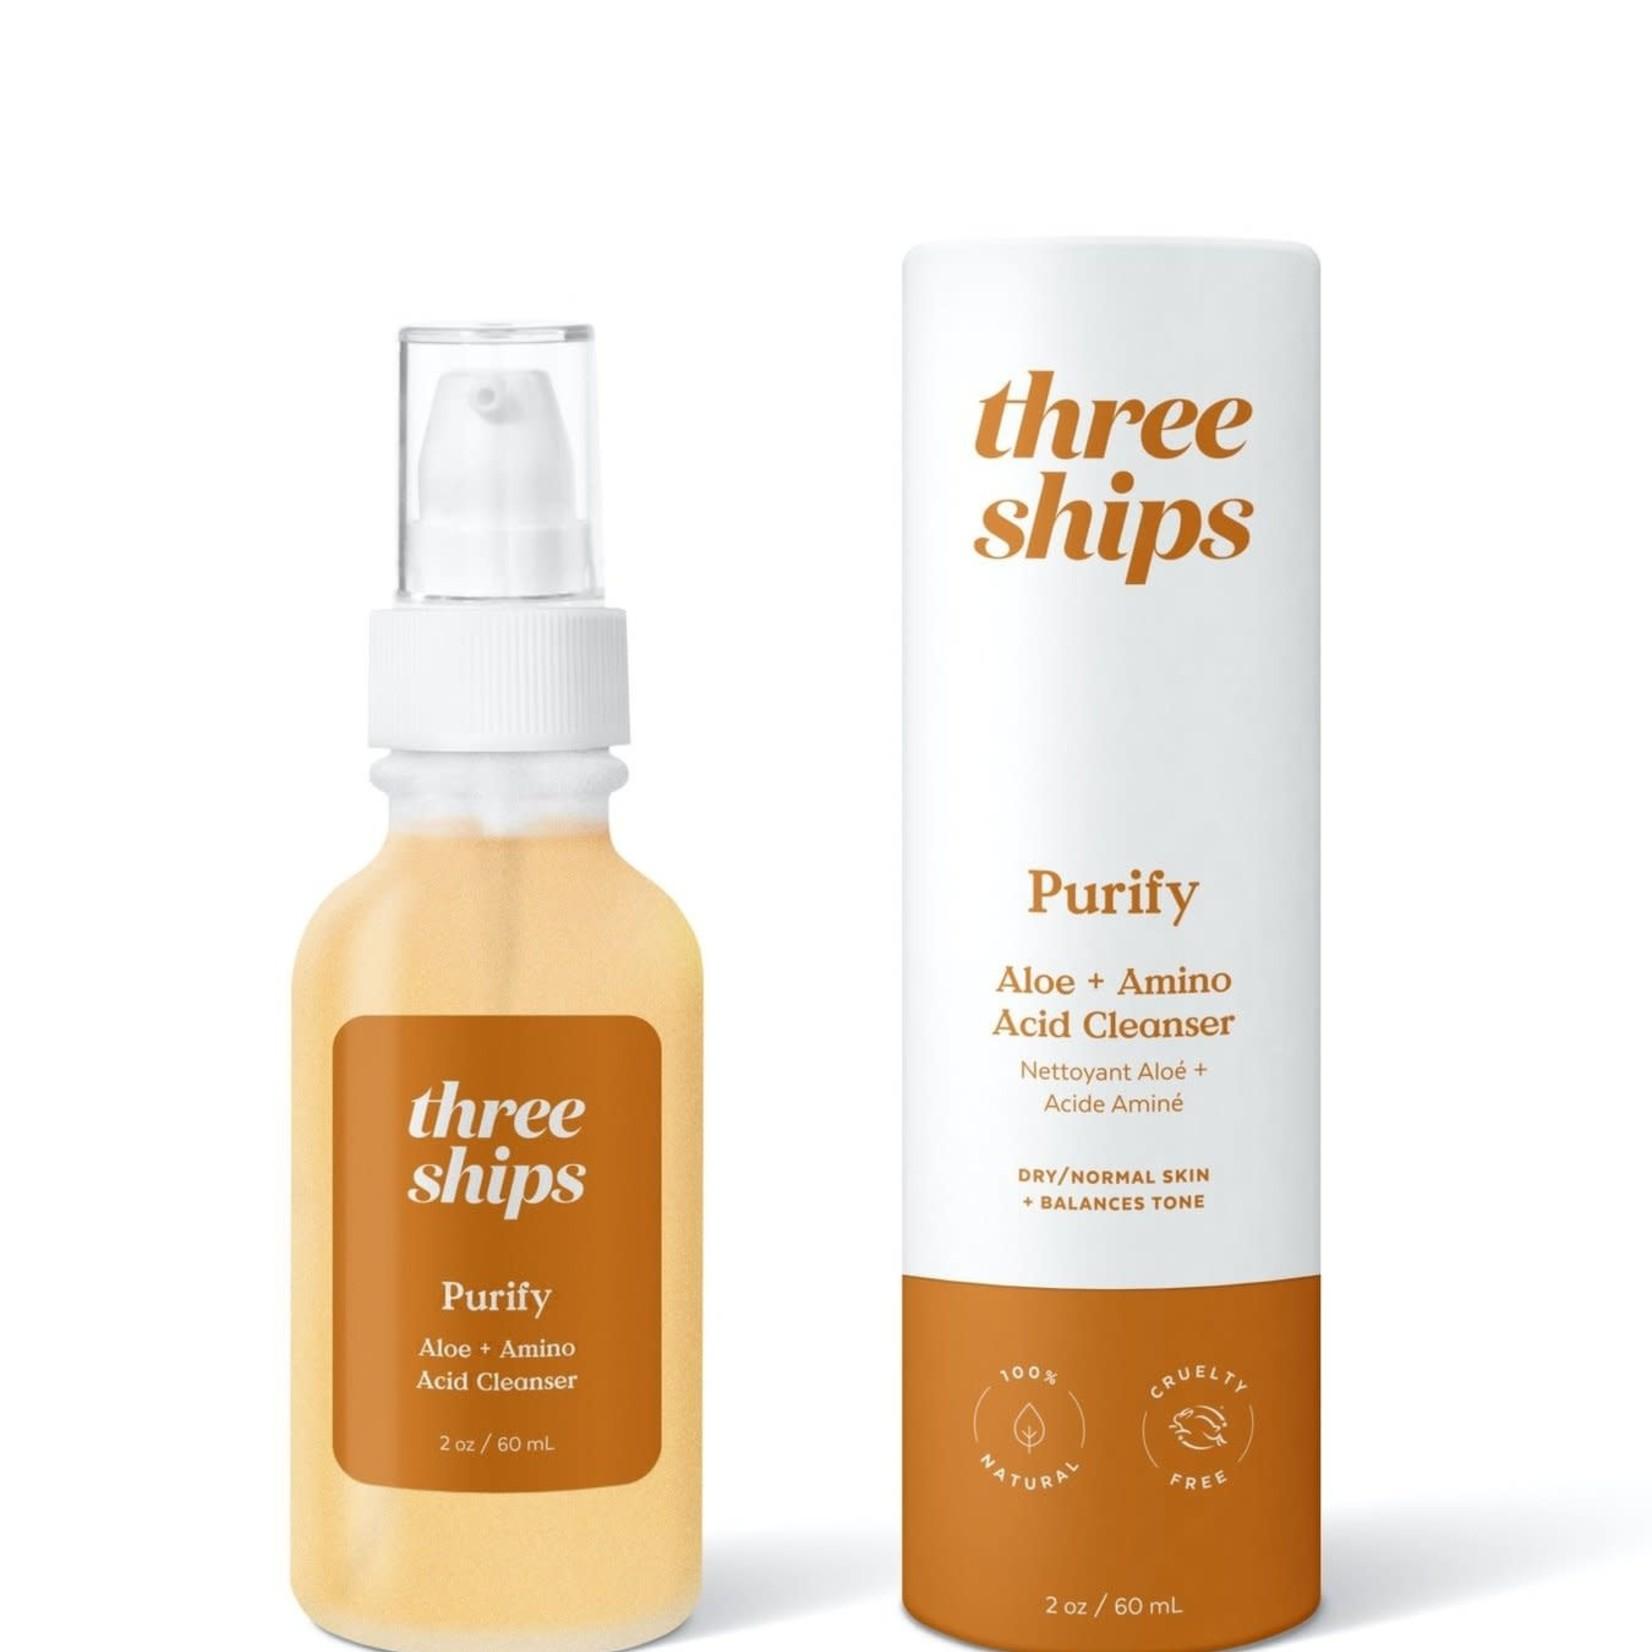 Three ships PURIFY NETTOYANT ALOÈS + ACIDE AMINÉ